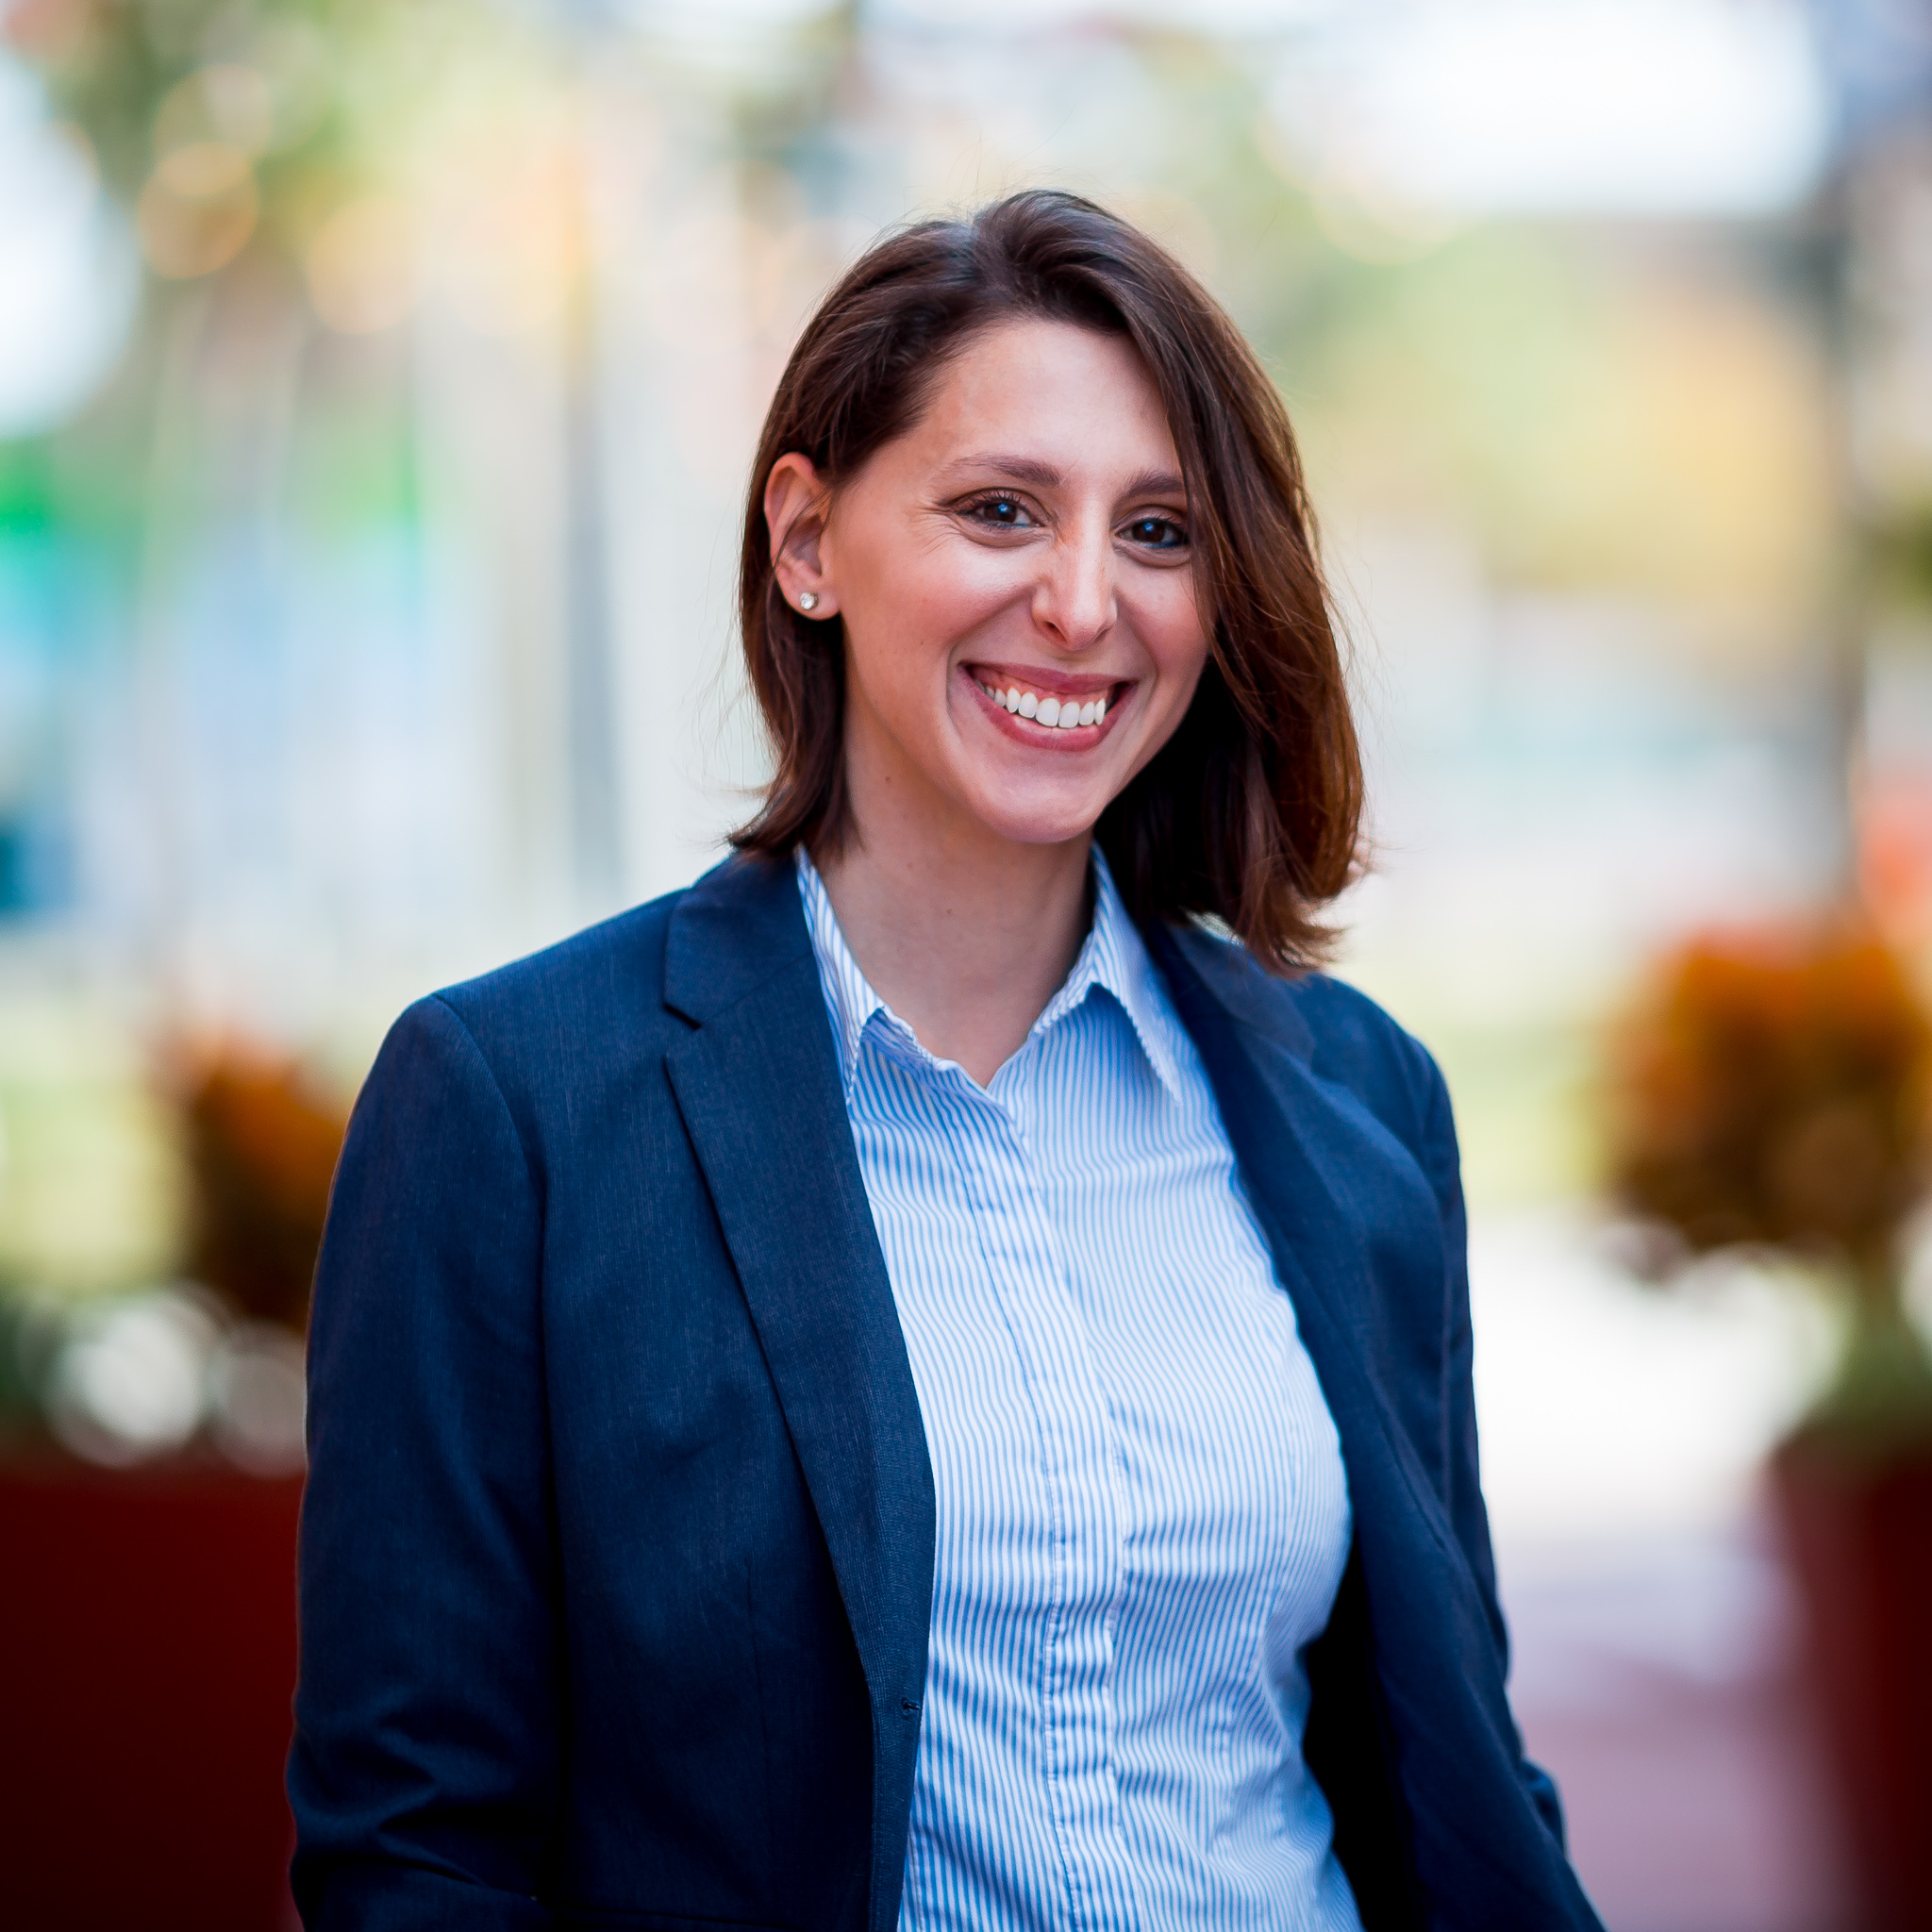 Daytona Beach Family Law Attorney Maria Indelicato